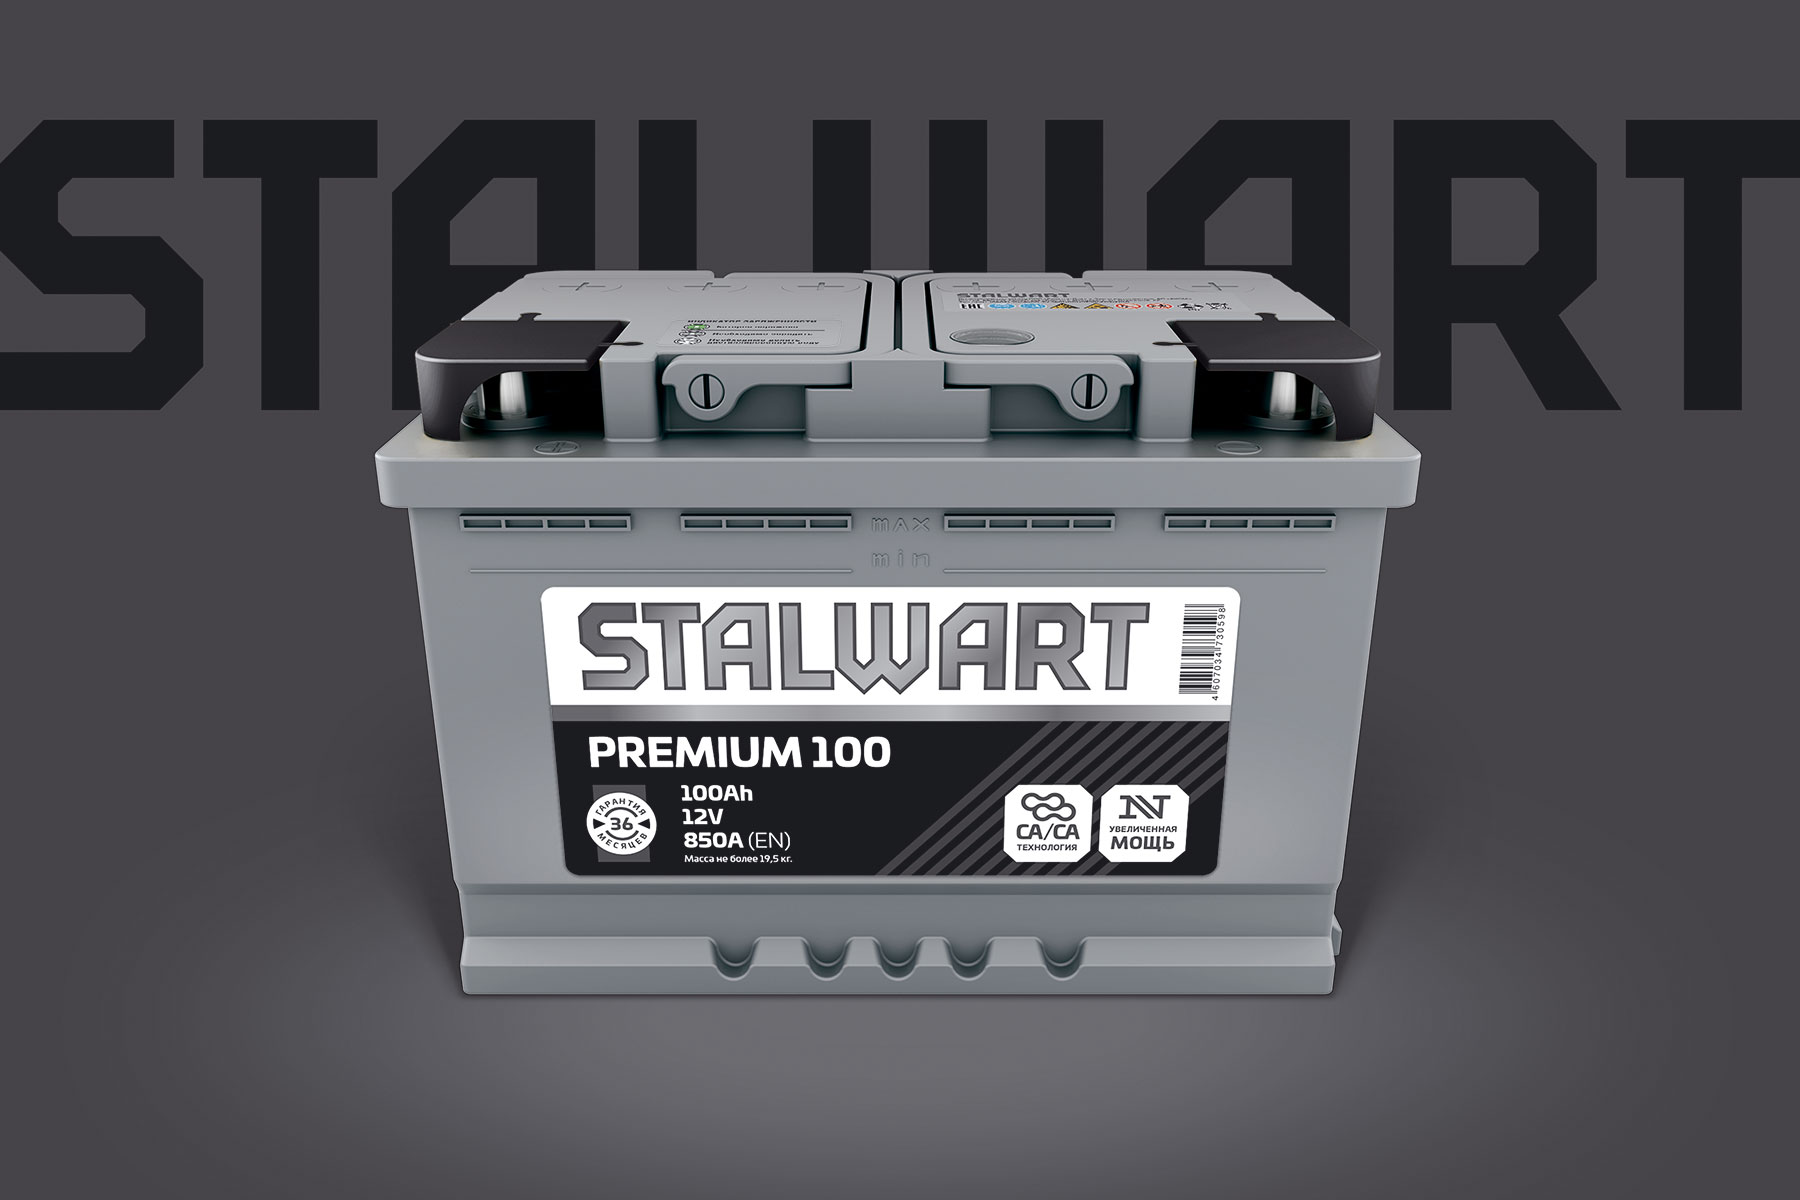 Stalwart-2-Premium-Front.jpg